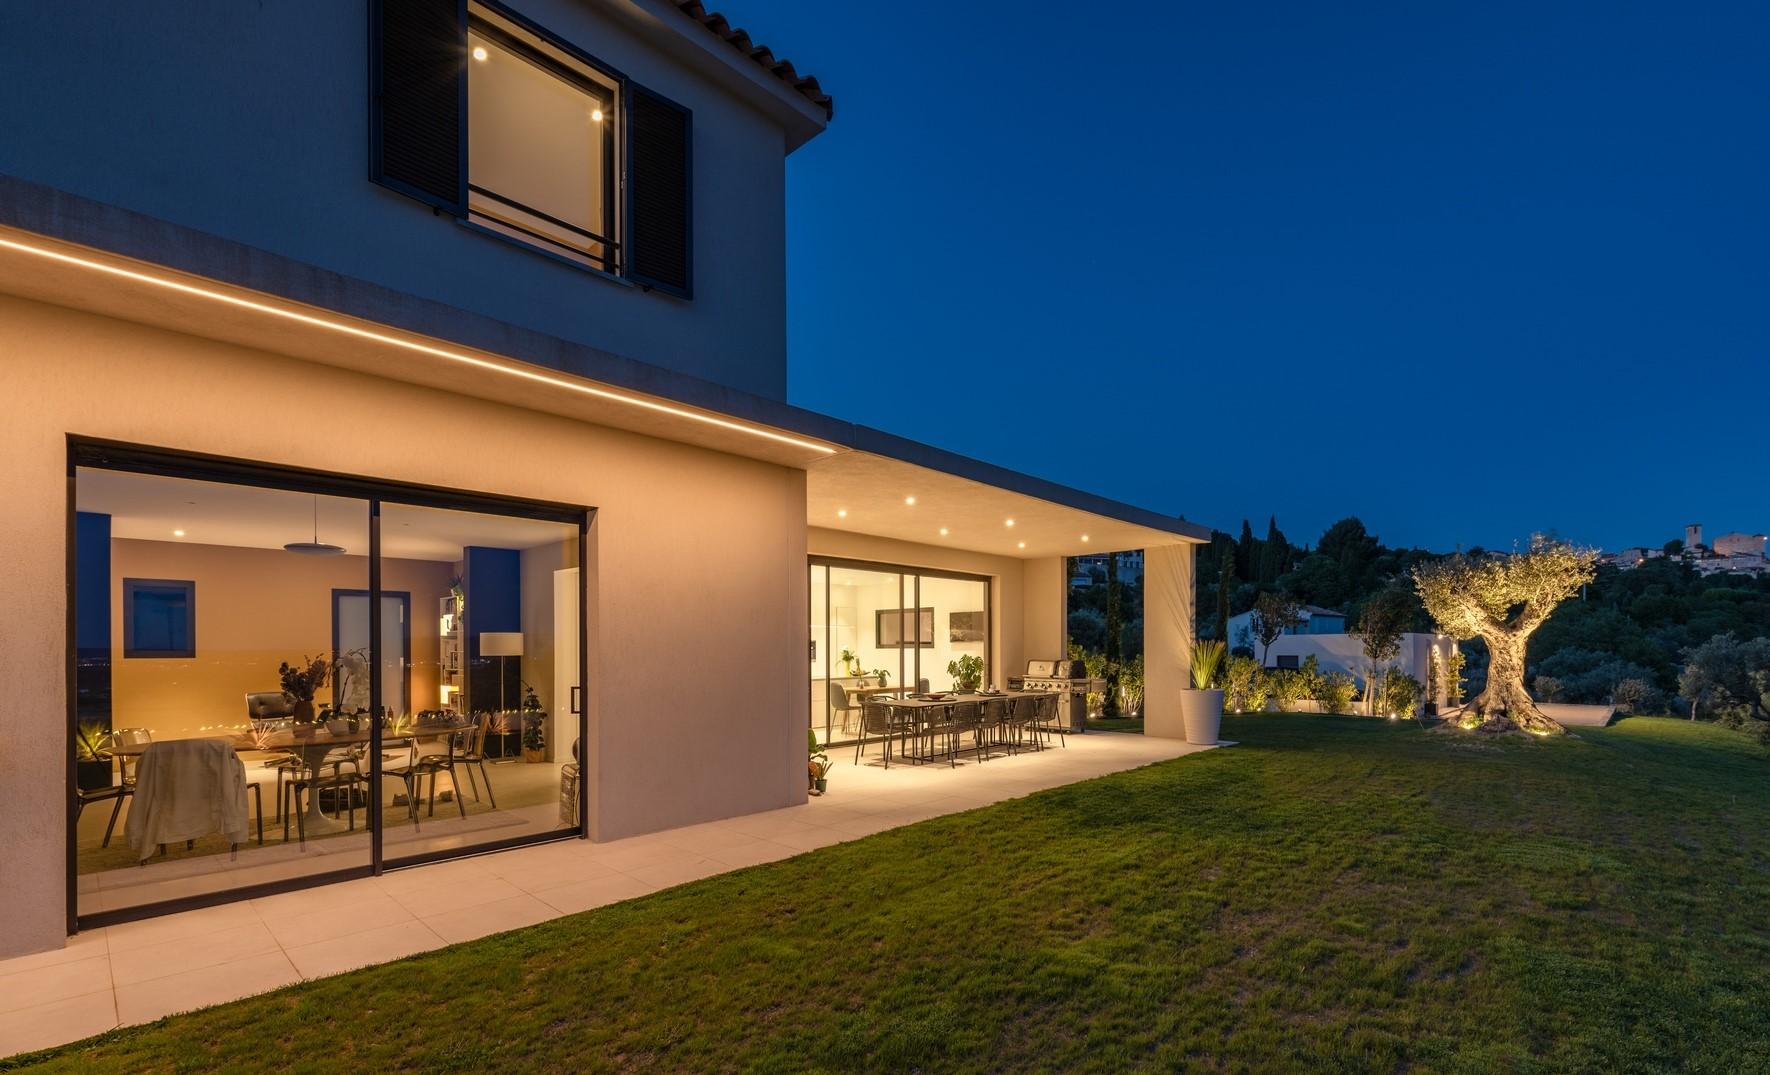 Eclairage de la terrassa couverte de la villa privée Bravo